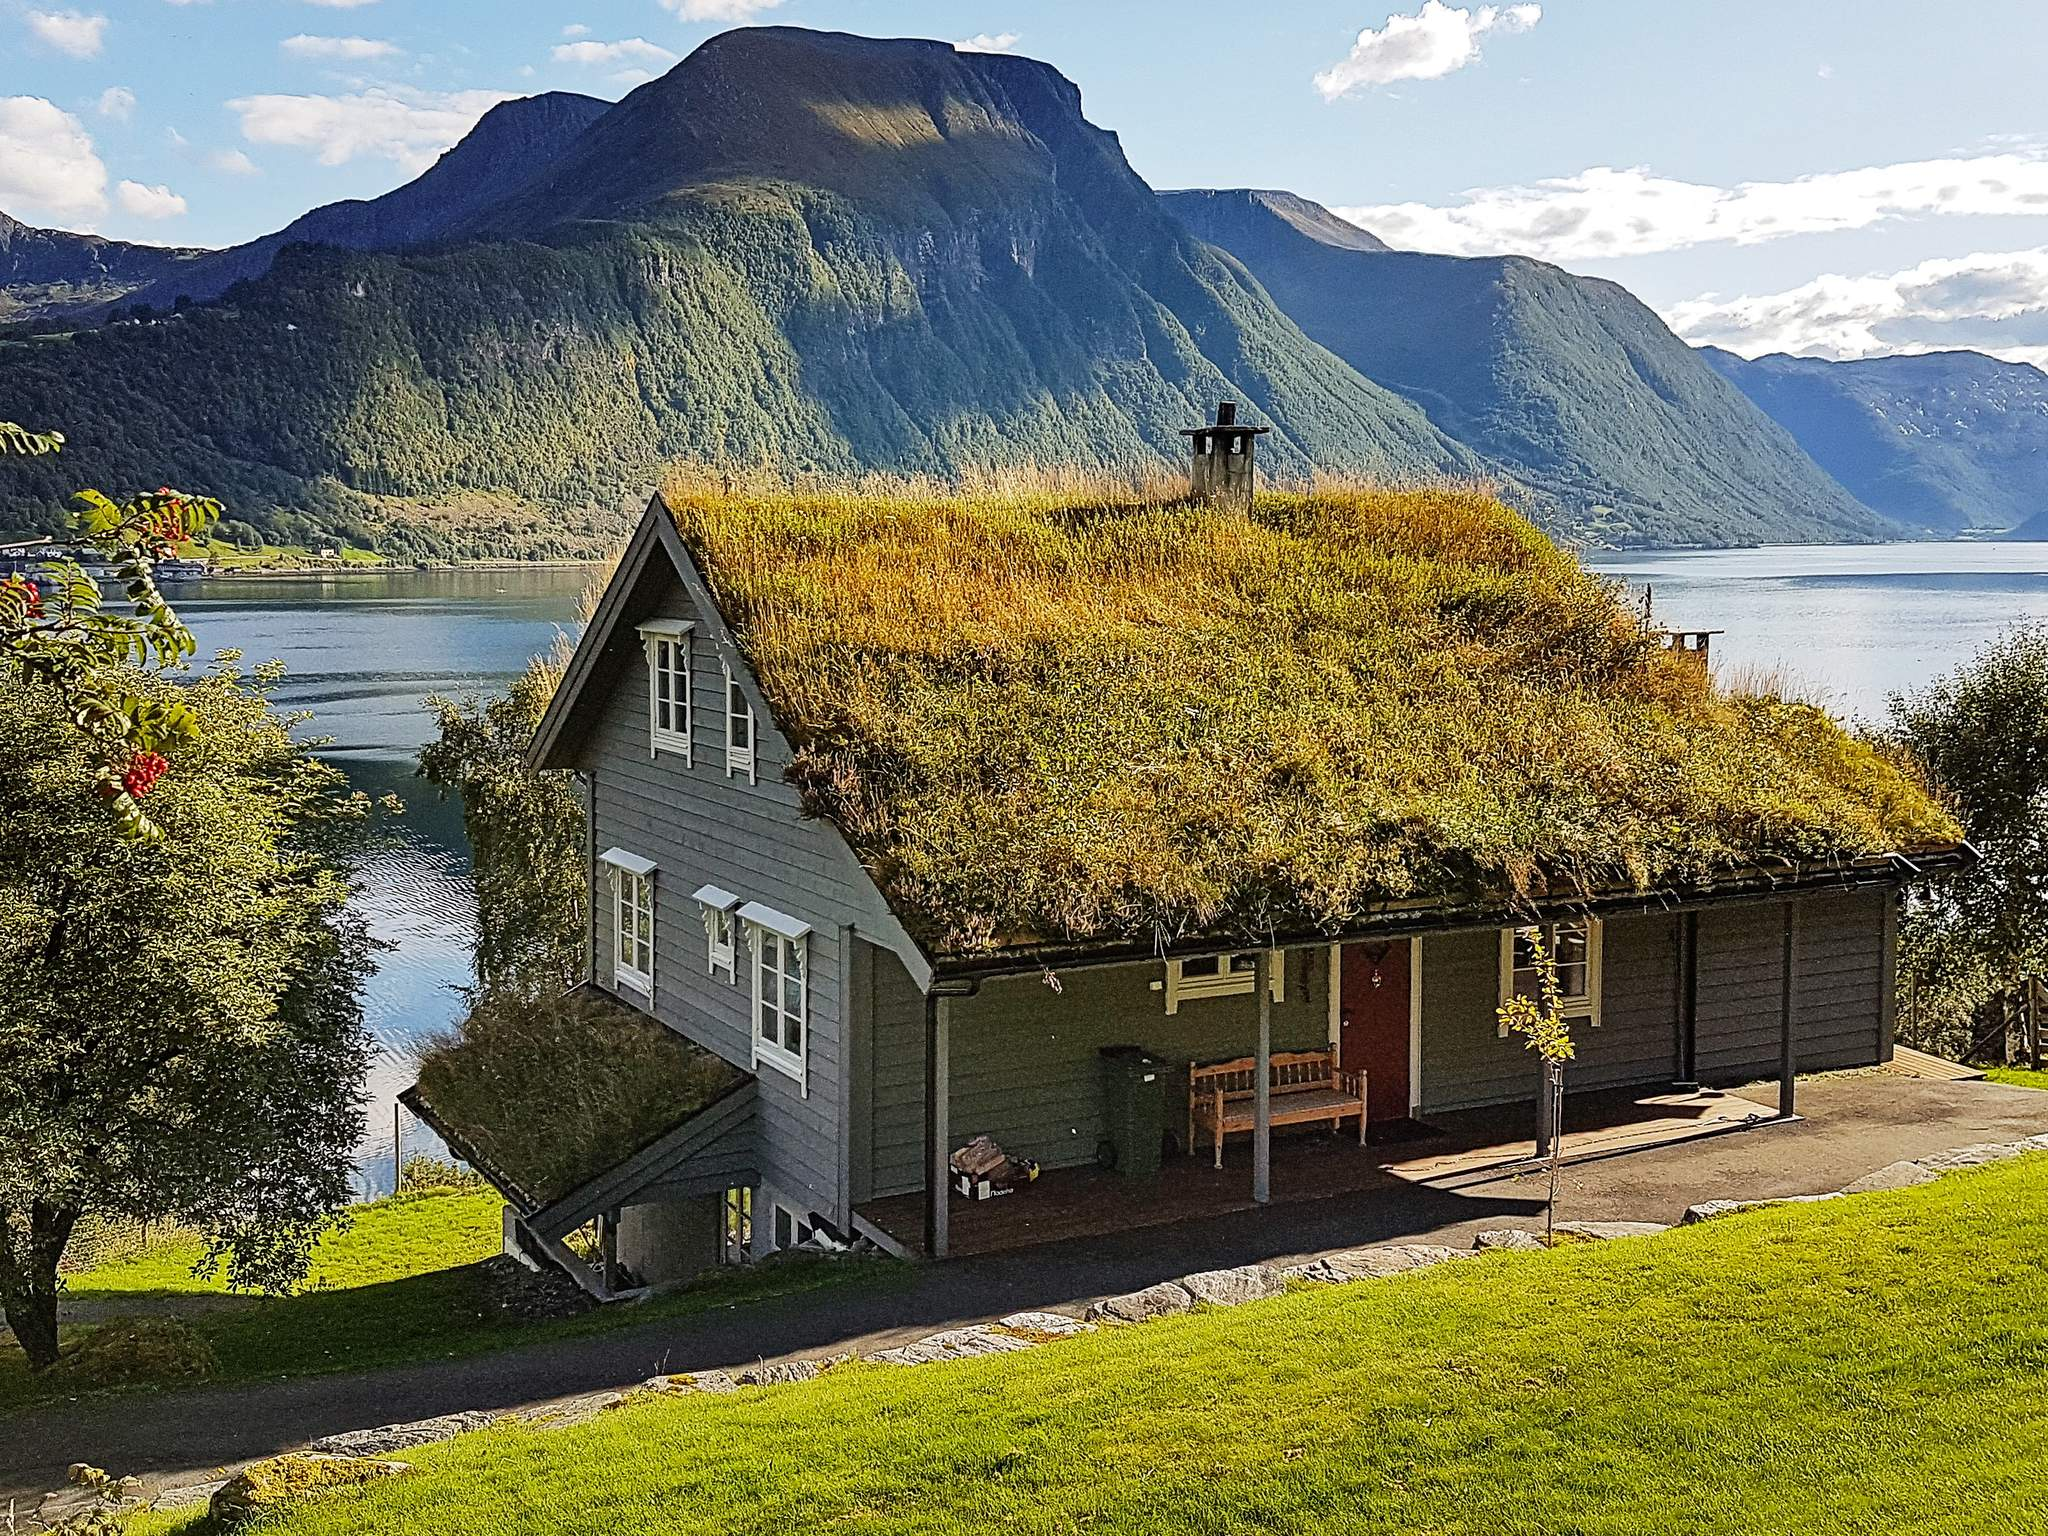 Ferienhaus Innselsetbygda (1043168), Lauvstad, More - Romsdal, Westnorwegen, Norwegen, Bild 1